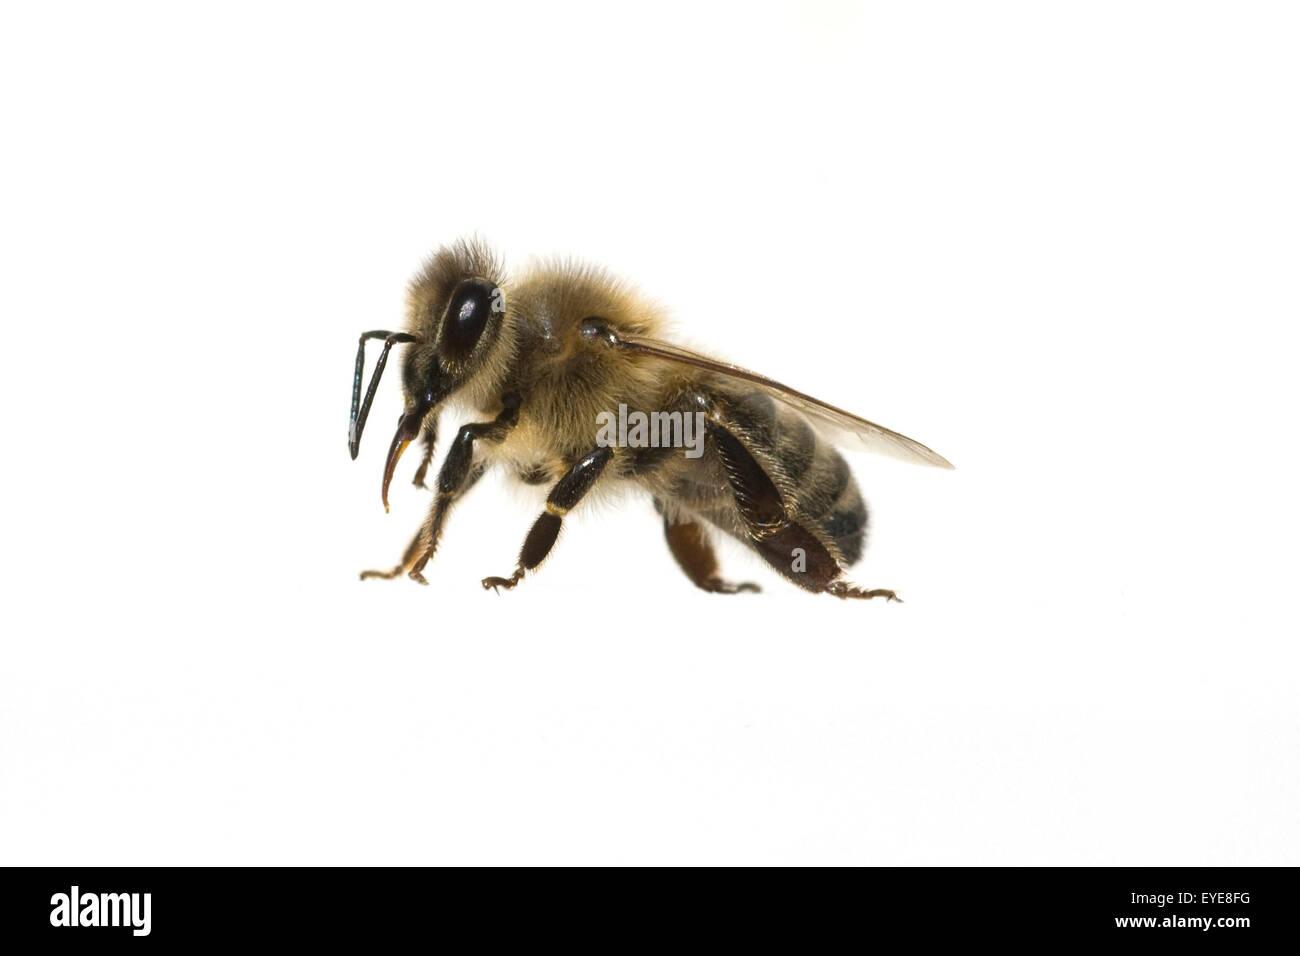 Biene; Apis, mellifera; Honigbiene; Insekt; - Stock Image